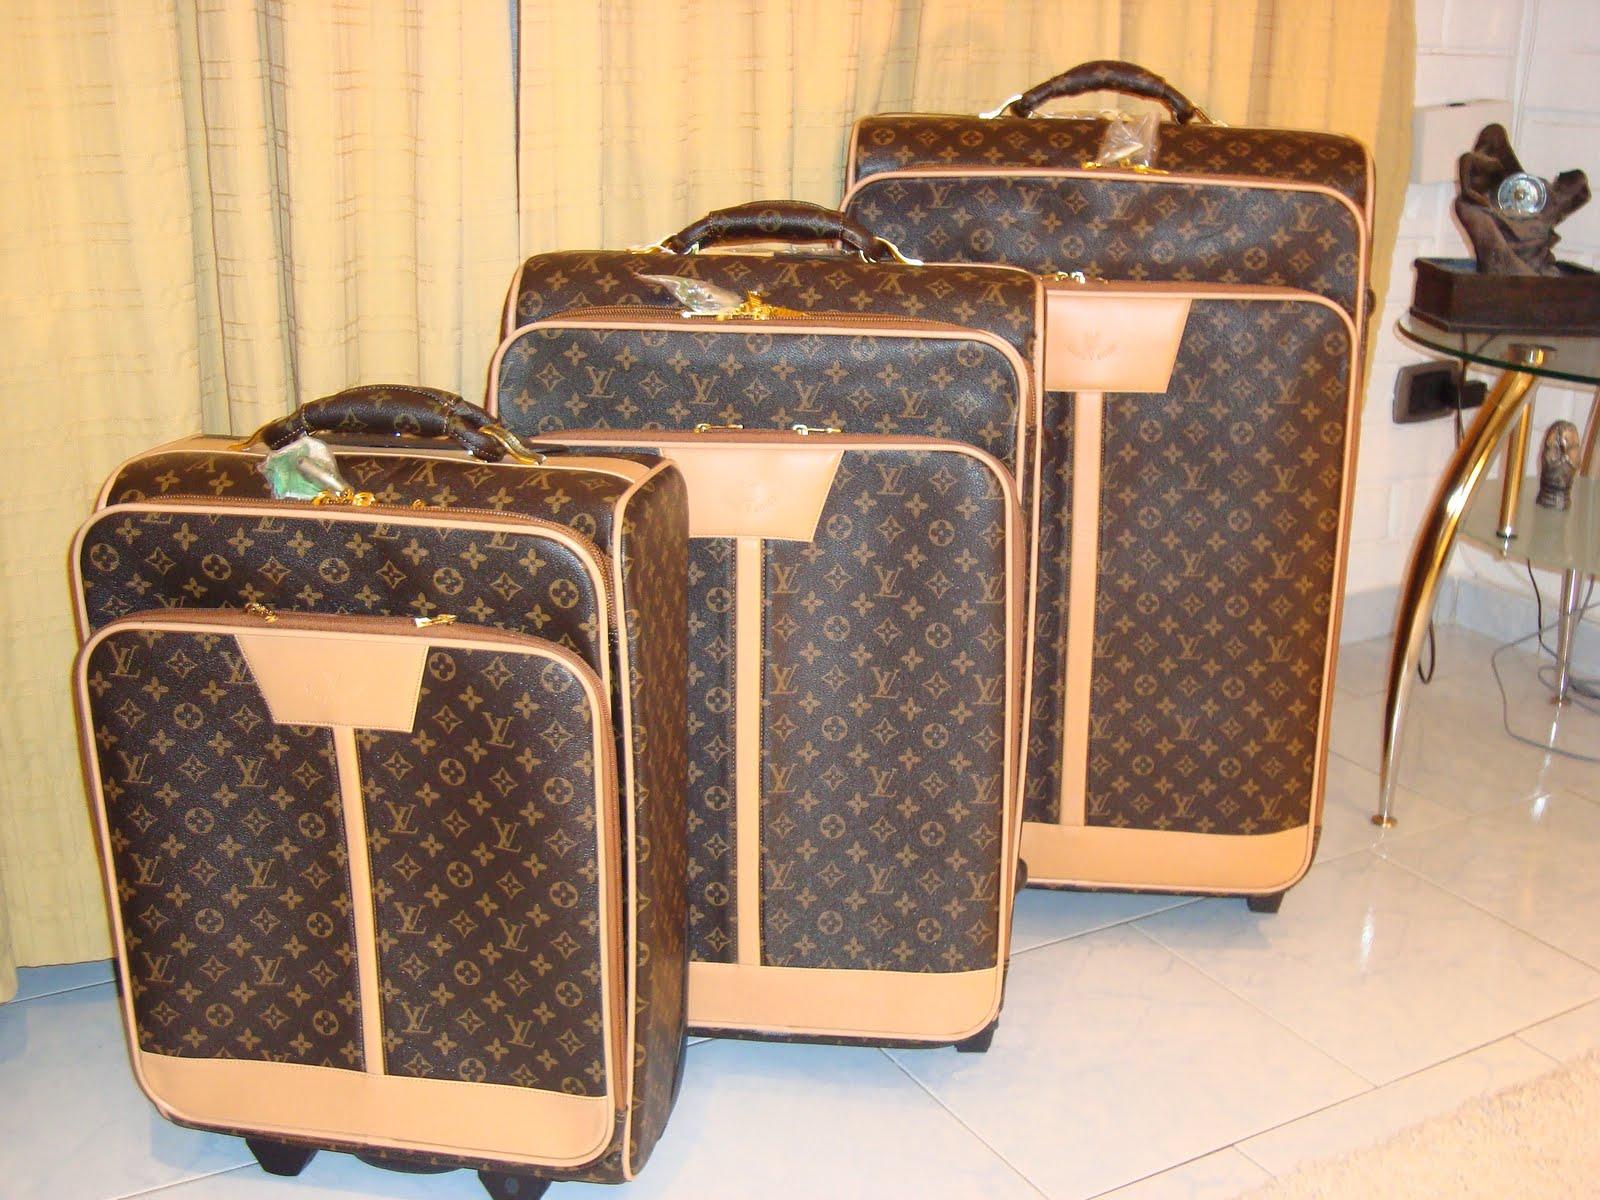 2188ff126 Maletas De Viaje Gucci Replicas | The Art of Mike Mignola